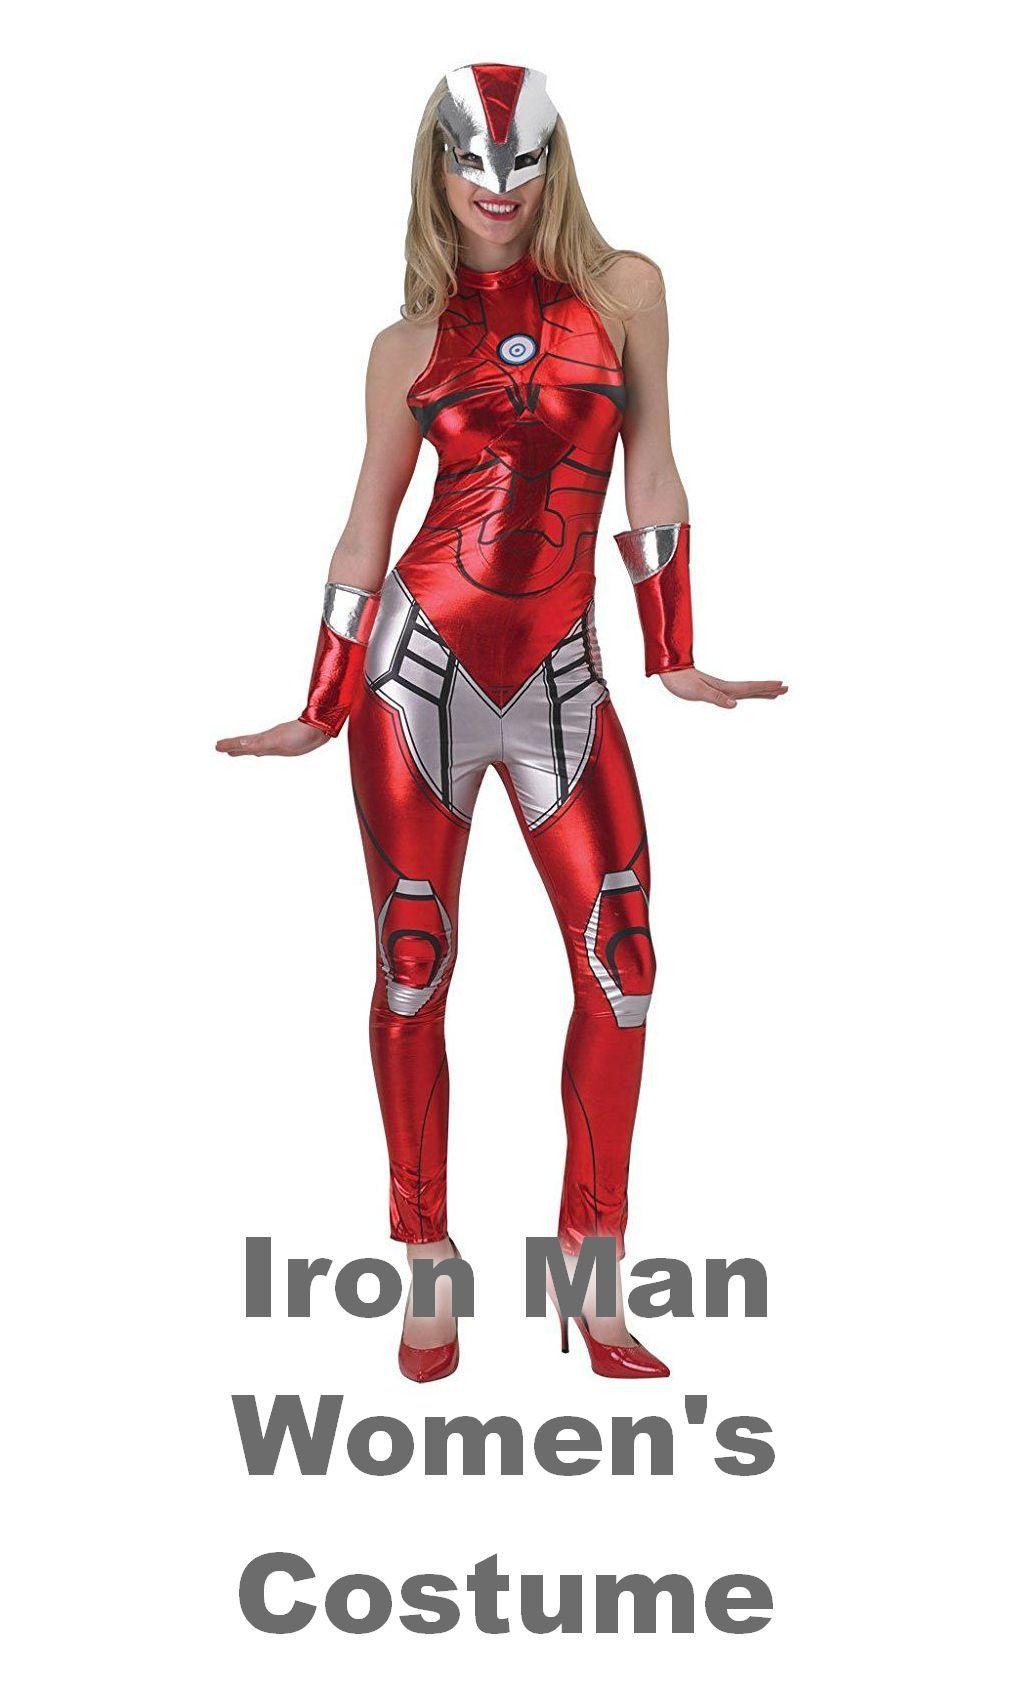 Iron Man Costume Superhero Costumes For Men Ironman Costume Super Hero Costumes